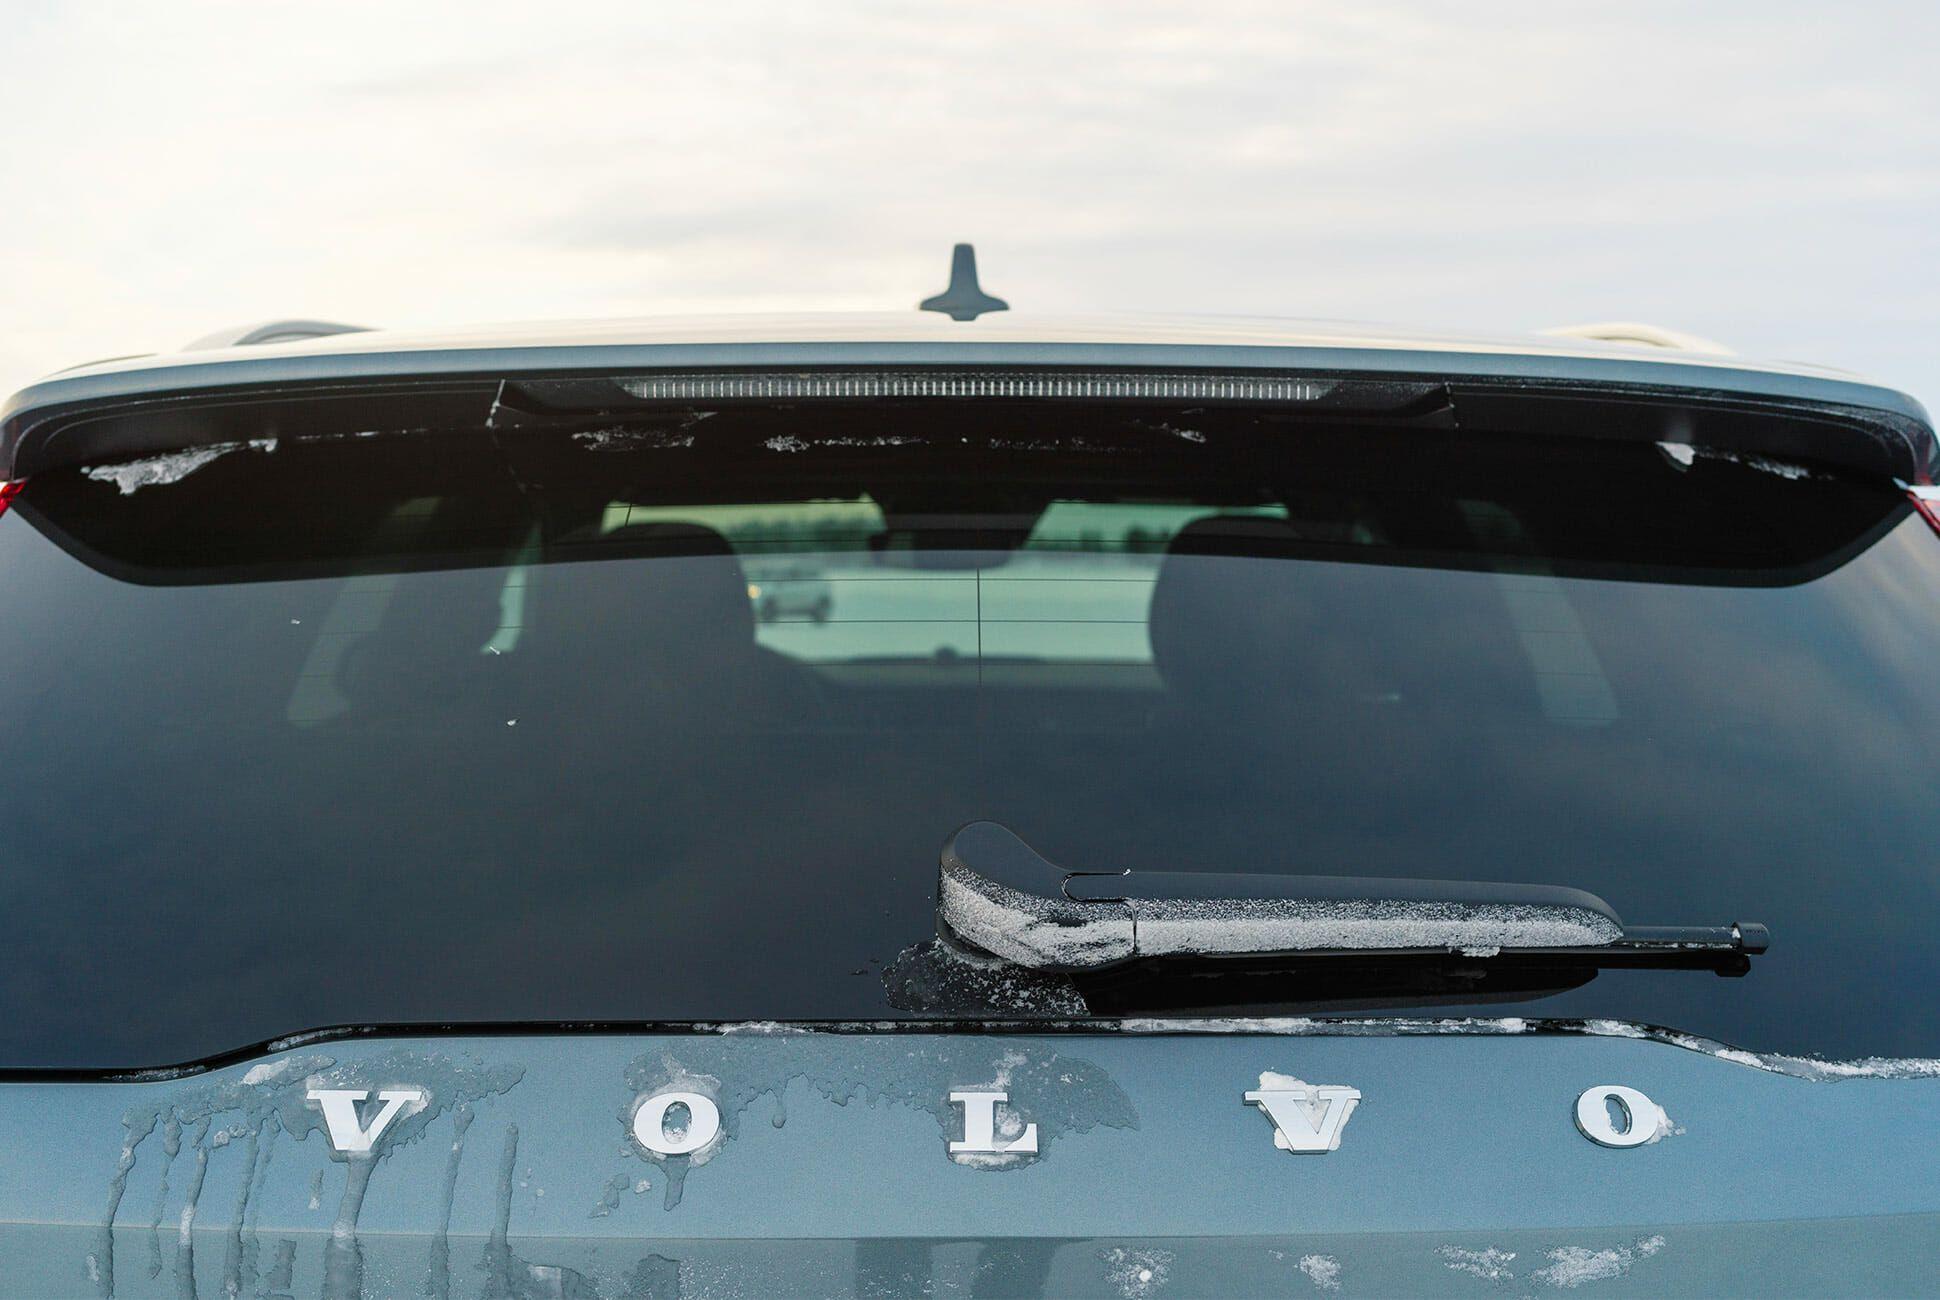 Volvo-V60-CC-gear-patrol-slide-2